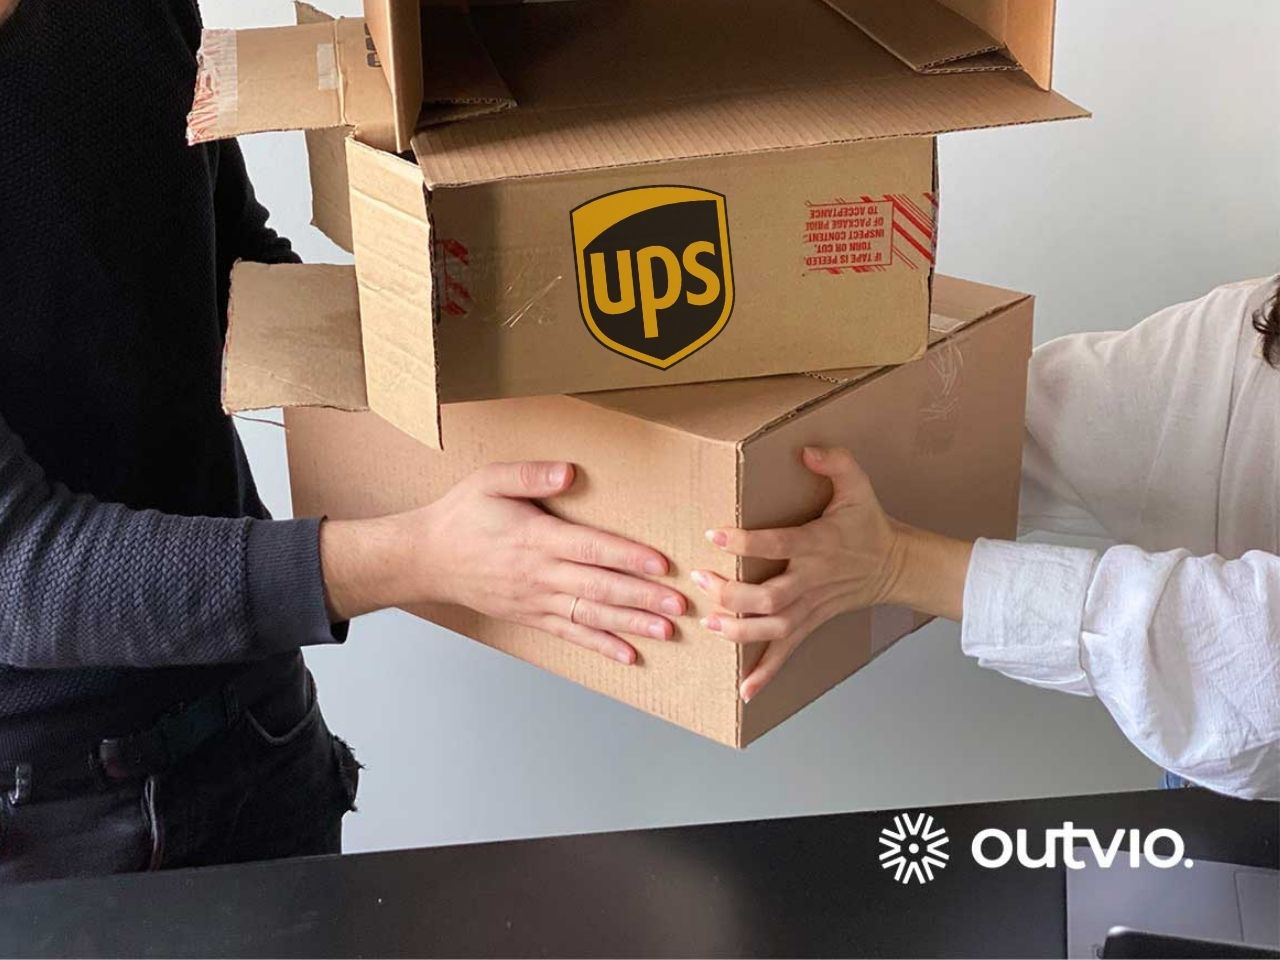 Envíos UPS: guía de envíos internacionales para e-Commerce